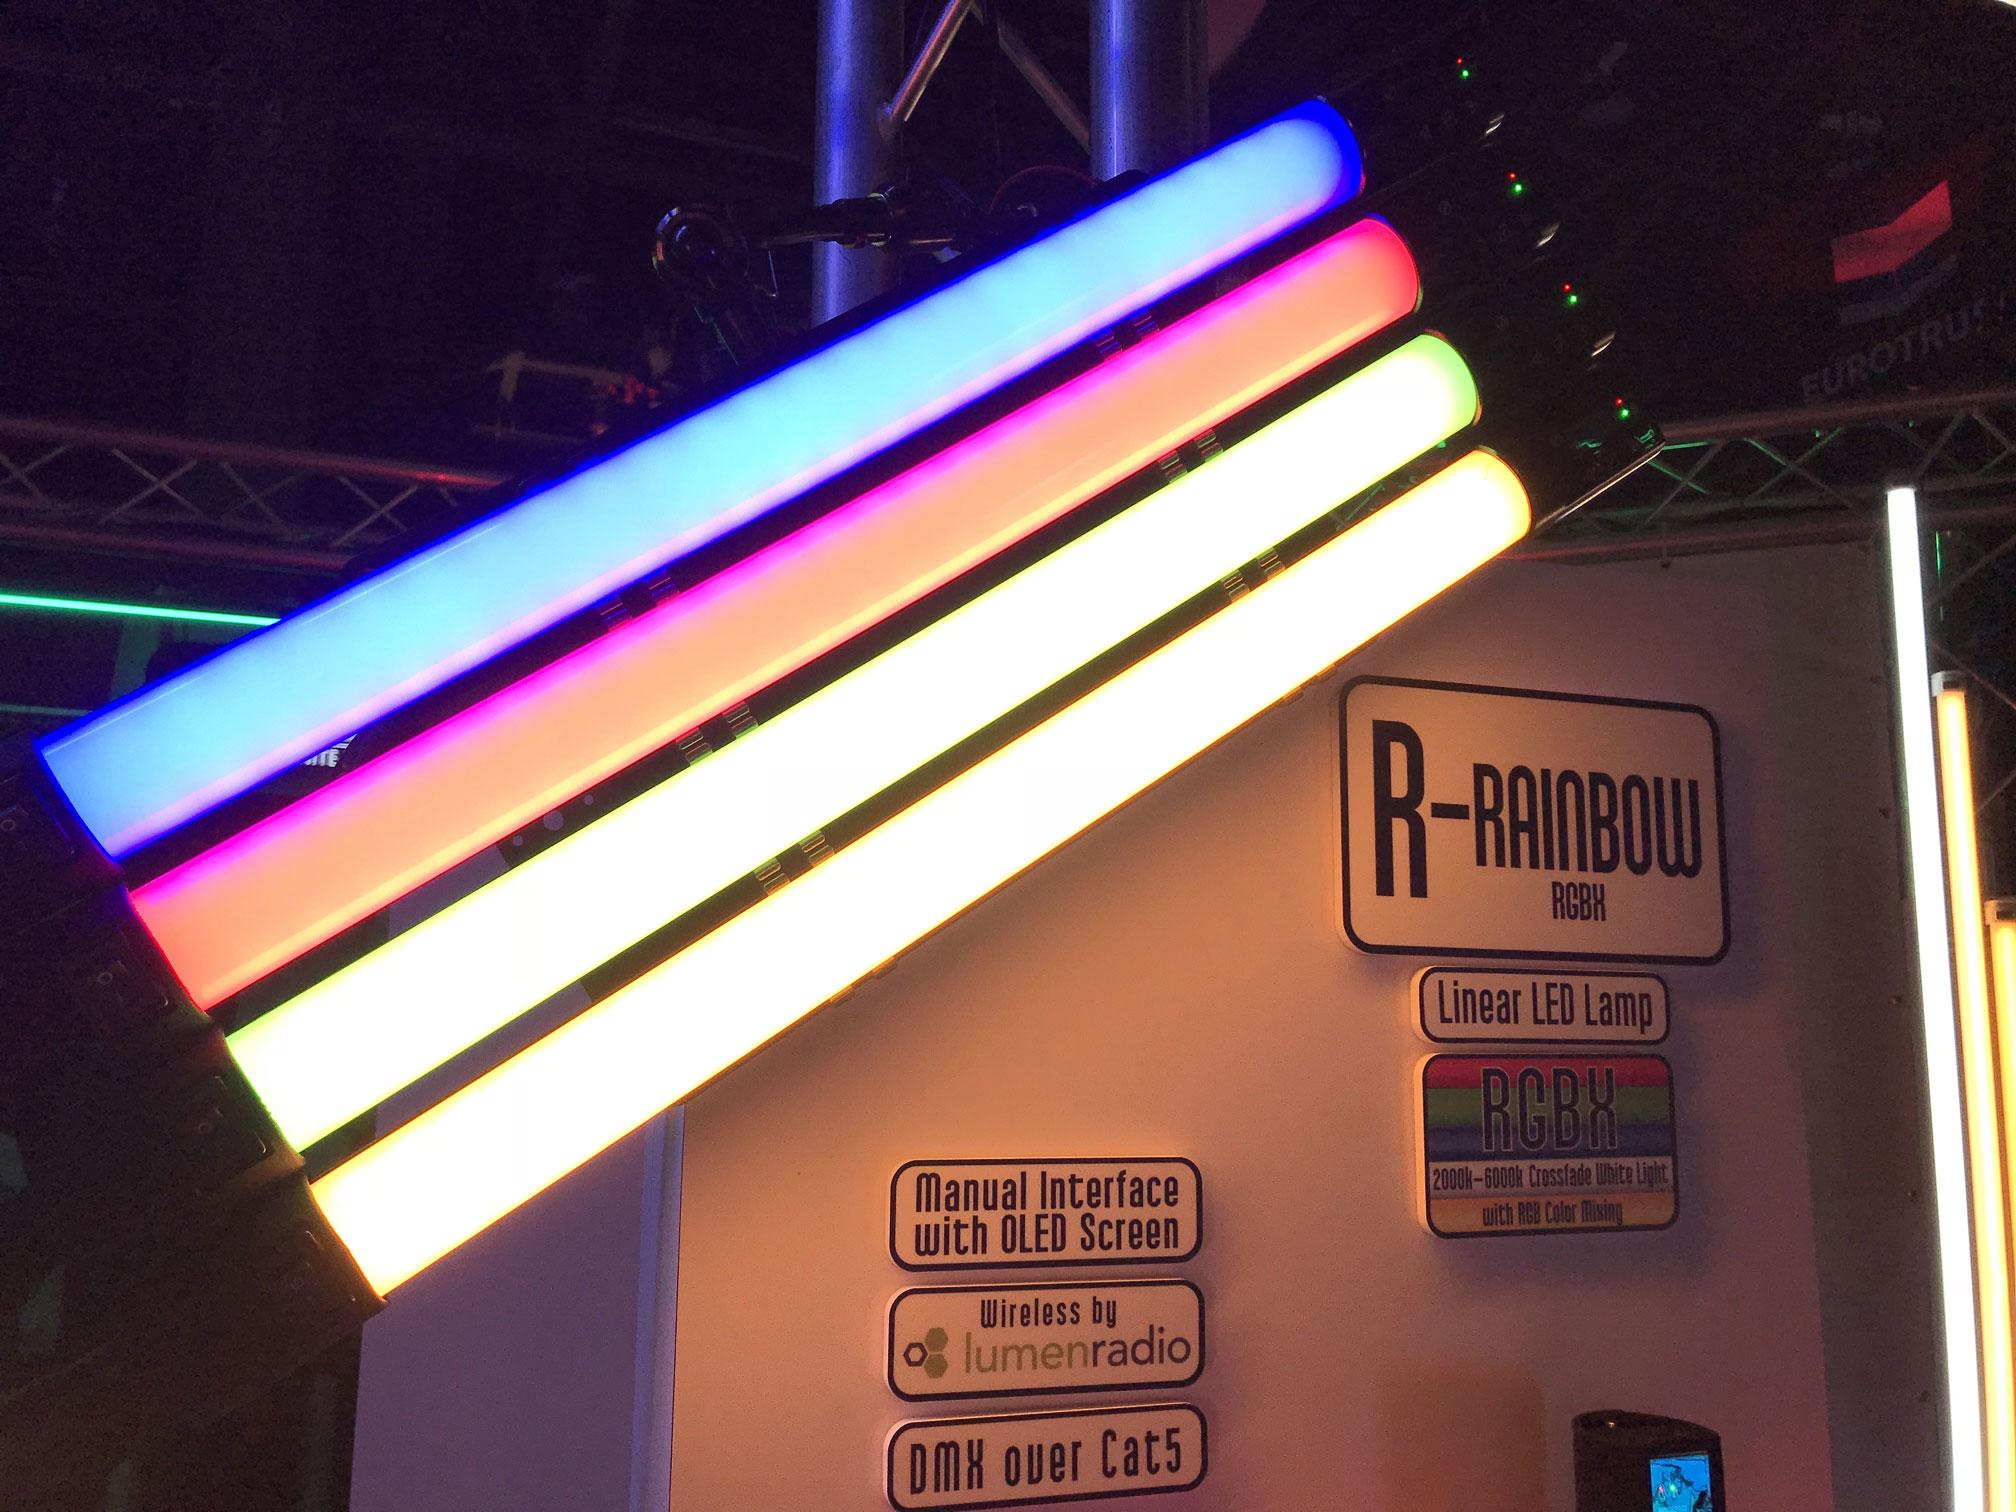 Quasar Science Q-LED Rainbow RGBX